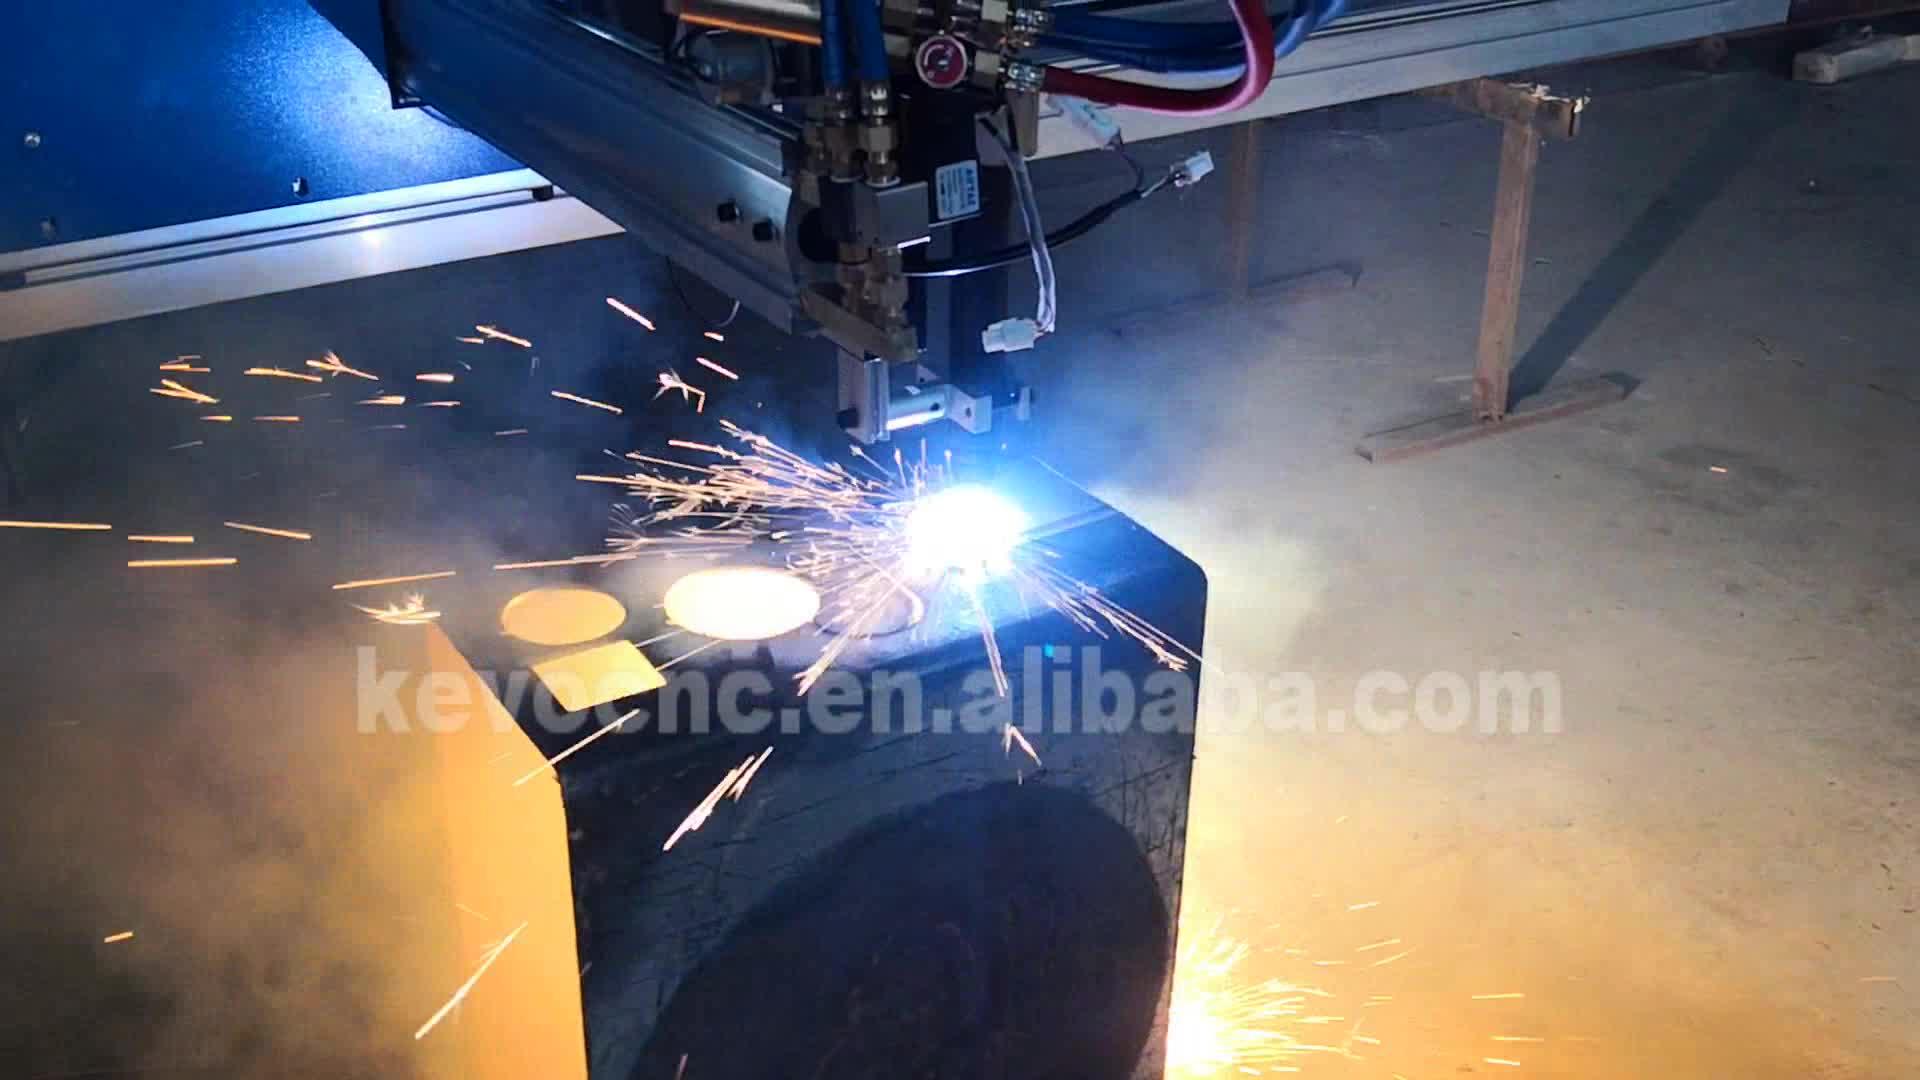 Easy mini cnc plasma เครื่องตัด Huayuan plasma เครื่องกำเนิดไฟฟ้า, 120A เครื่องตัดพลาสม่า